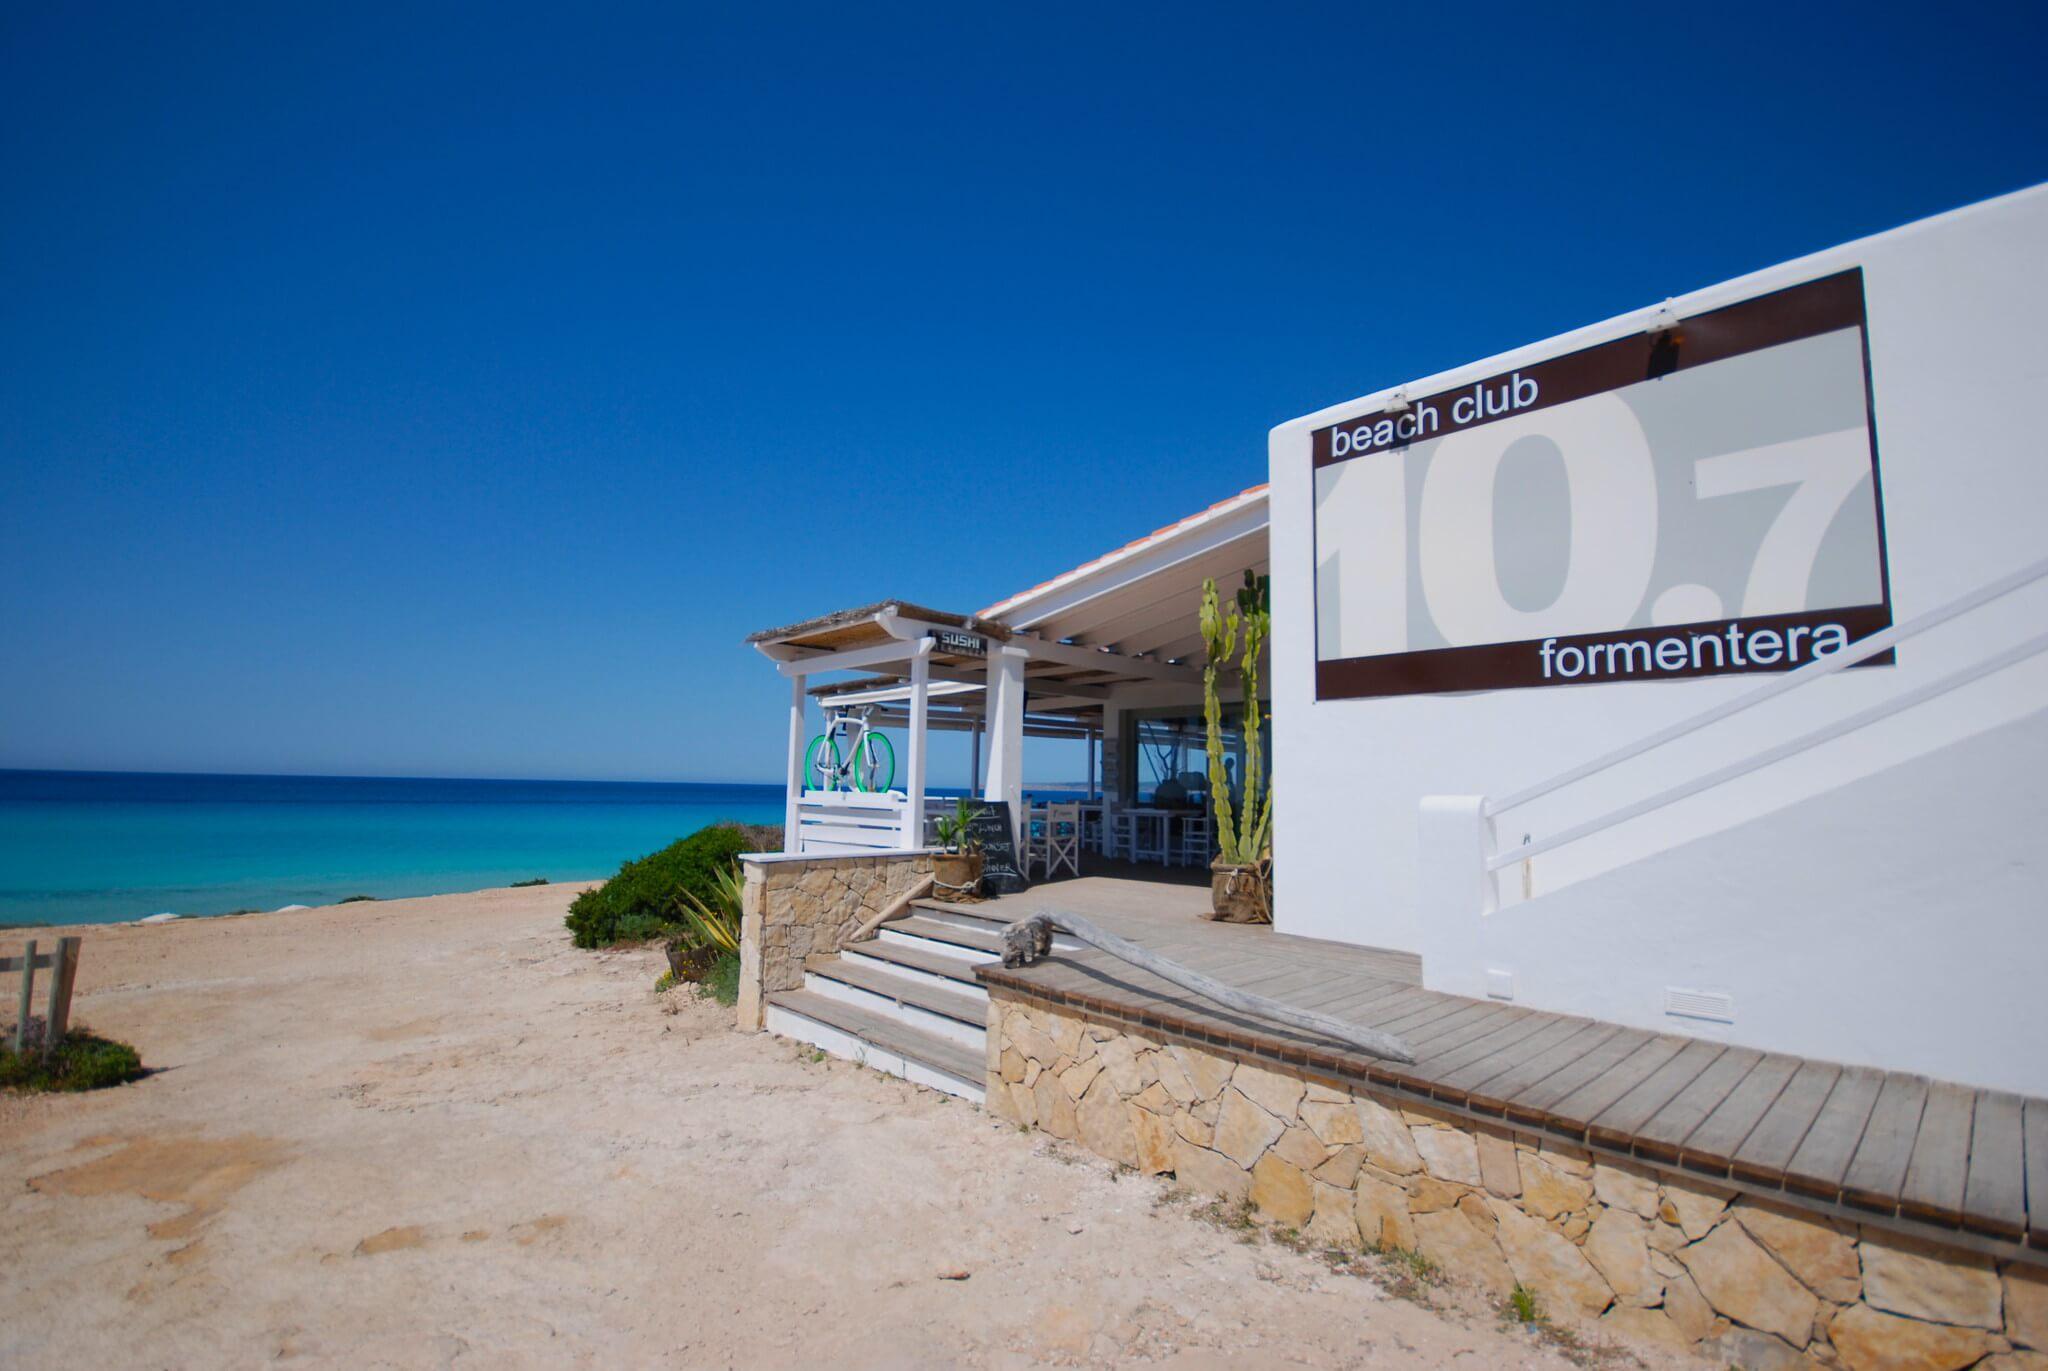 https://www.white-ibiza.com/wp-content/uploads/2020/03/formentera-beach-restaurants-10-punto7-2020-06.jpg